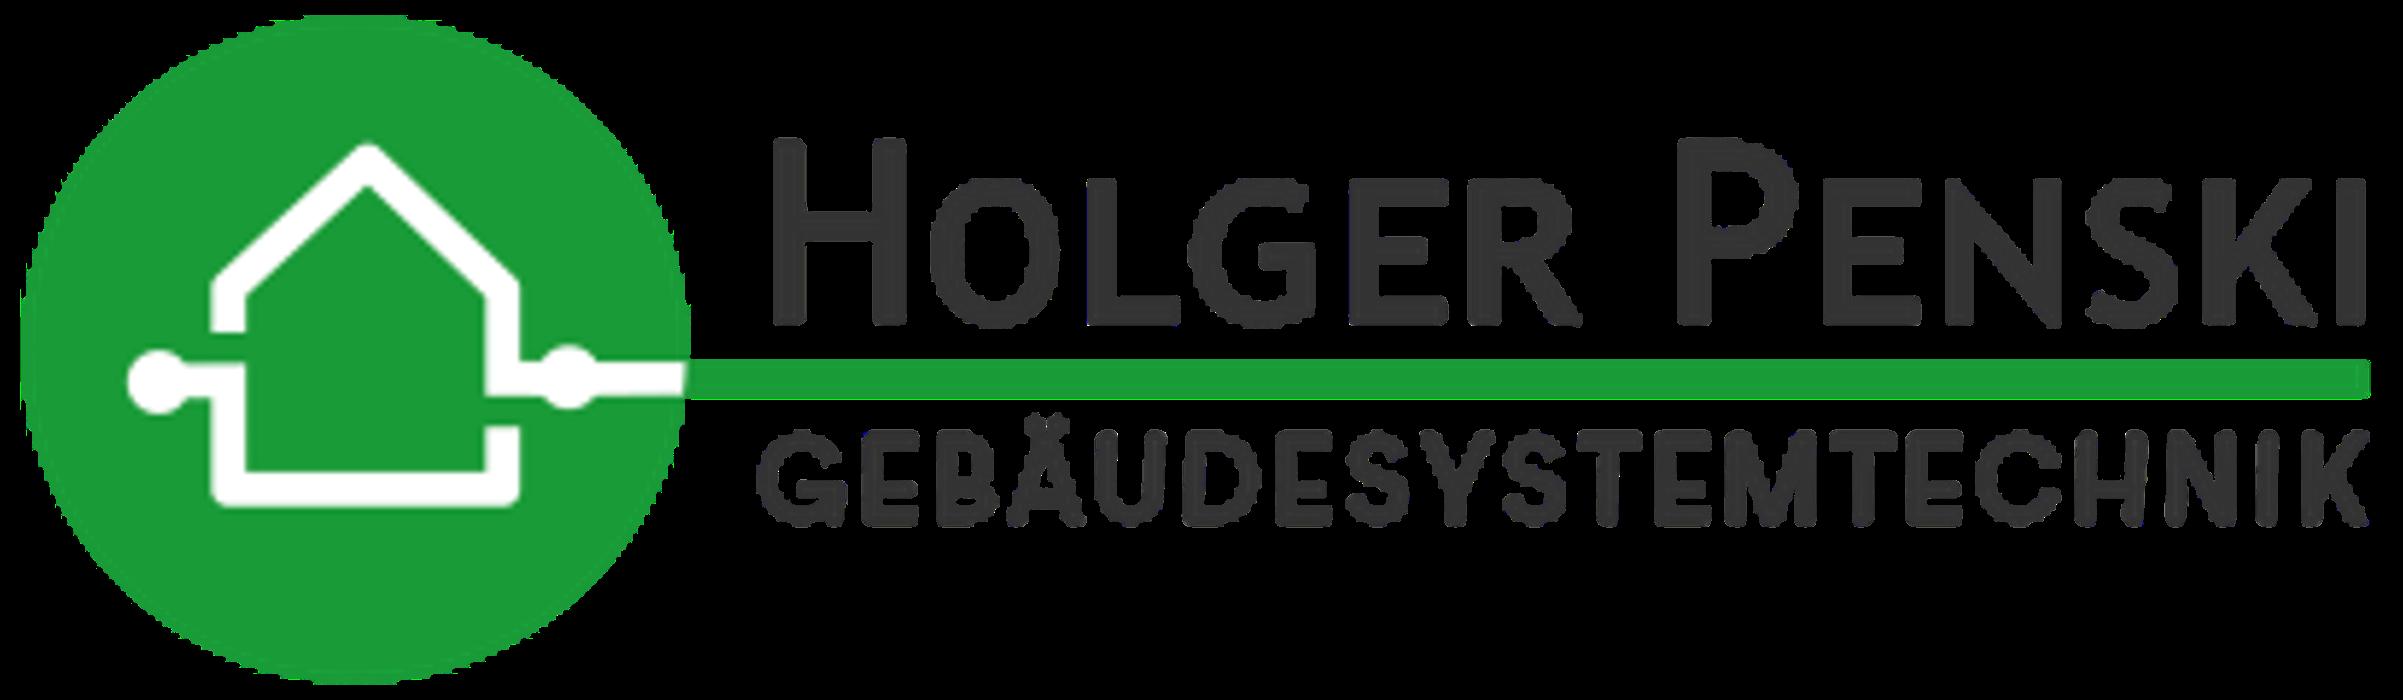 Holger Penski Gebäudesystemtechnik